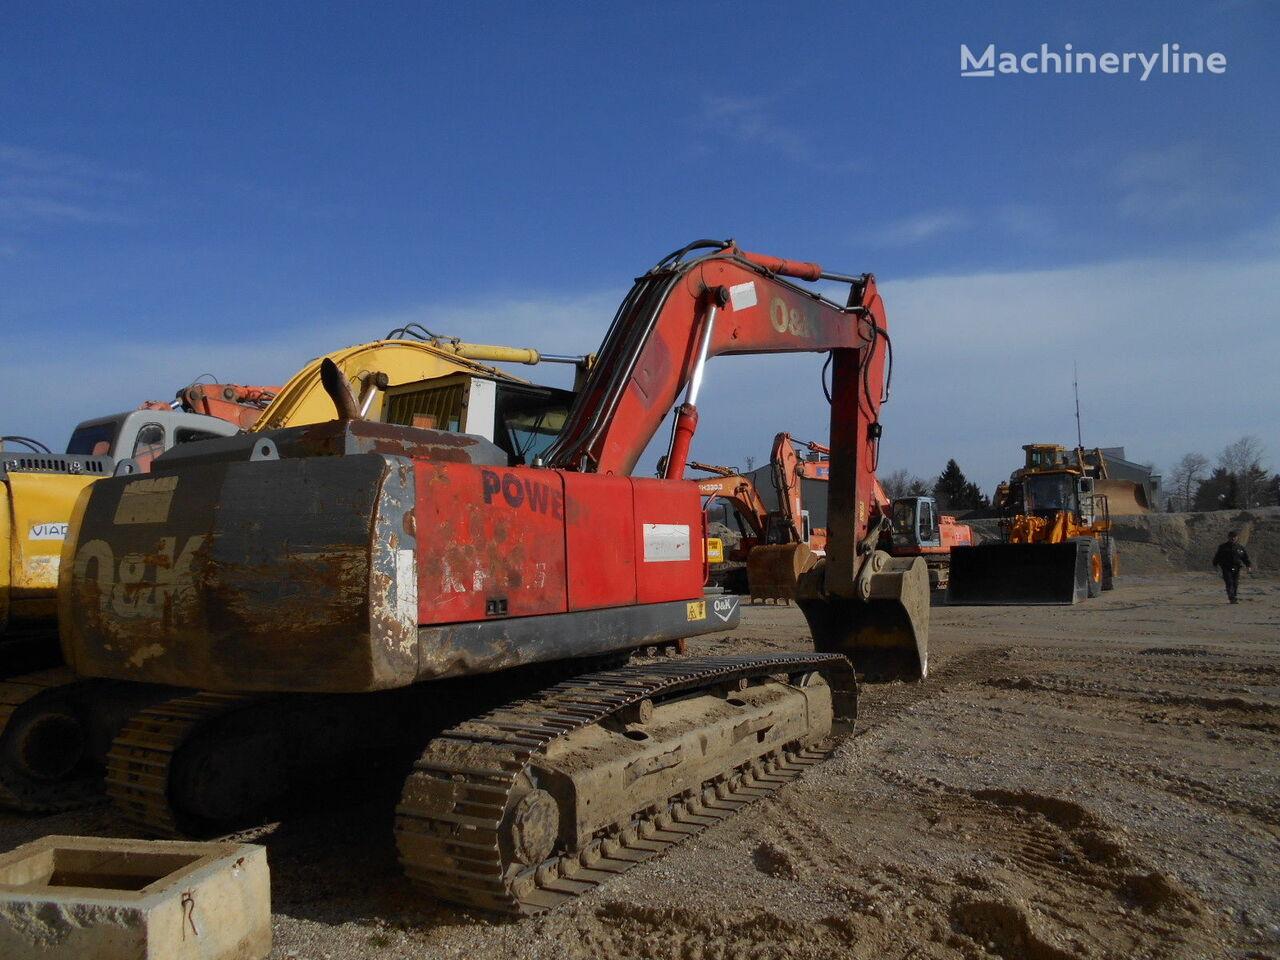 O&K RH8.5 tracked excavator